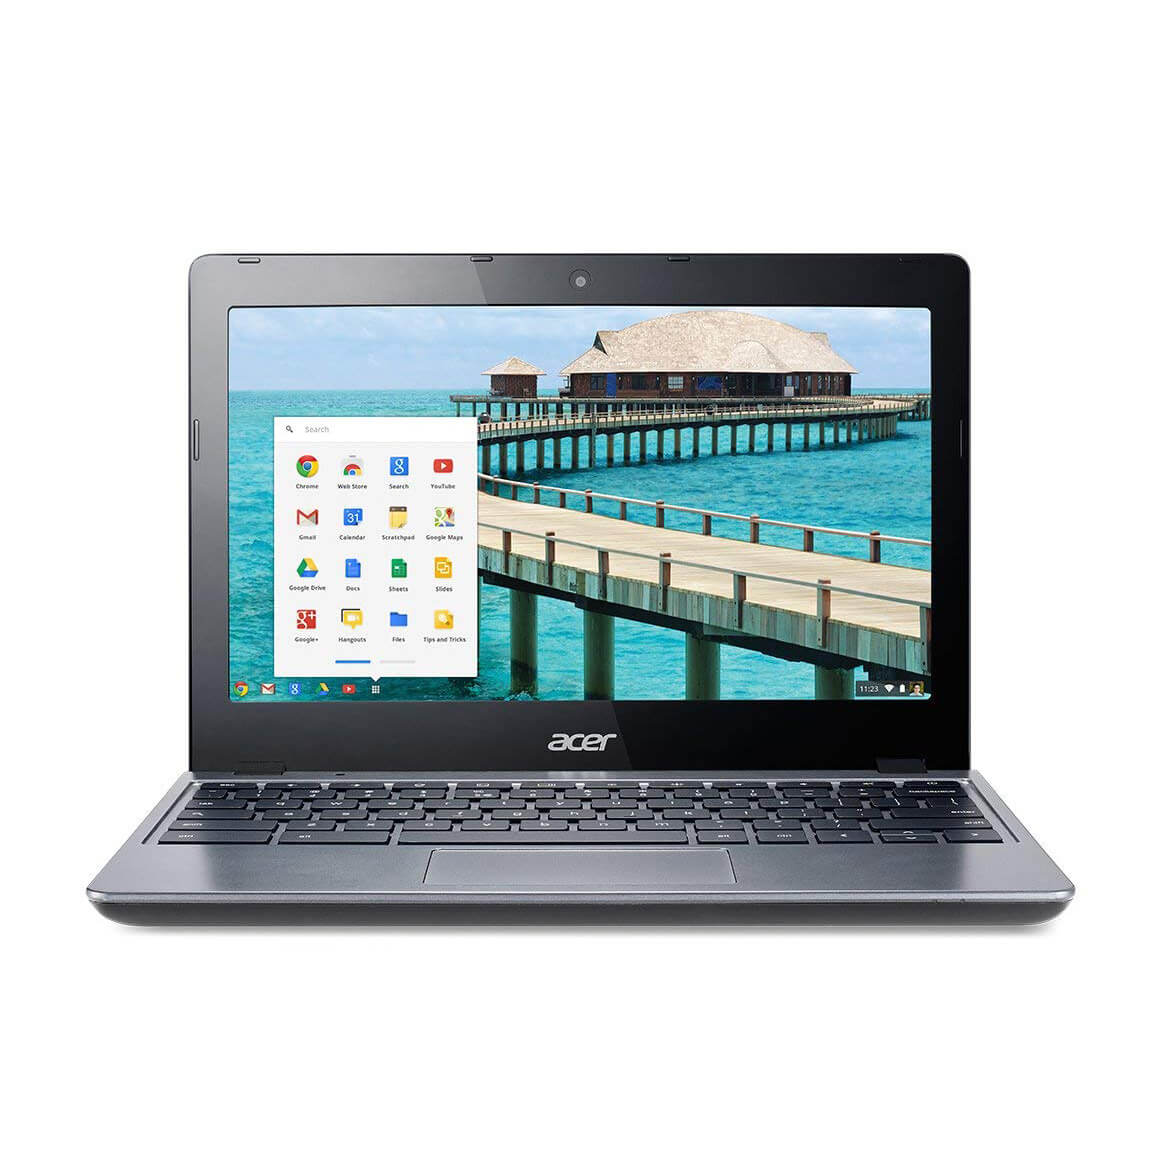 "Refurbished Acer C720-2103 11.6"" LED Chromebook Intel Celeron 1.4Ghz Dual Core 2GB 16GB SSD"